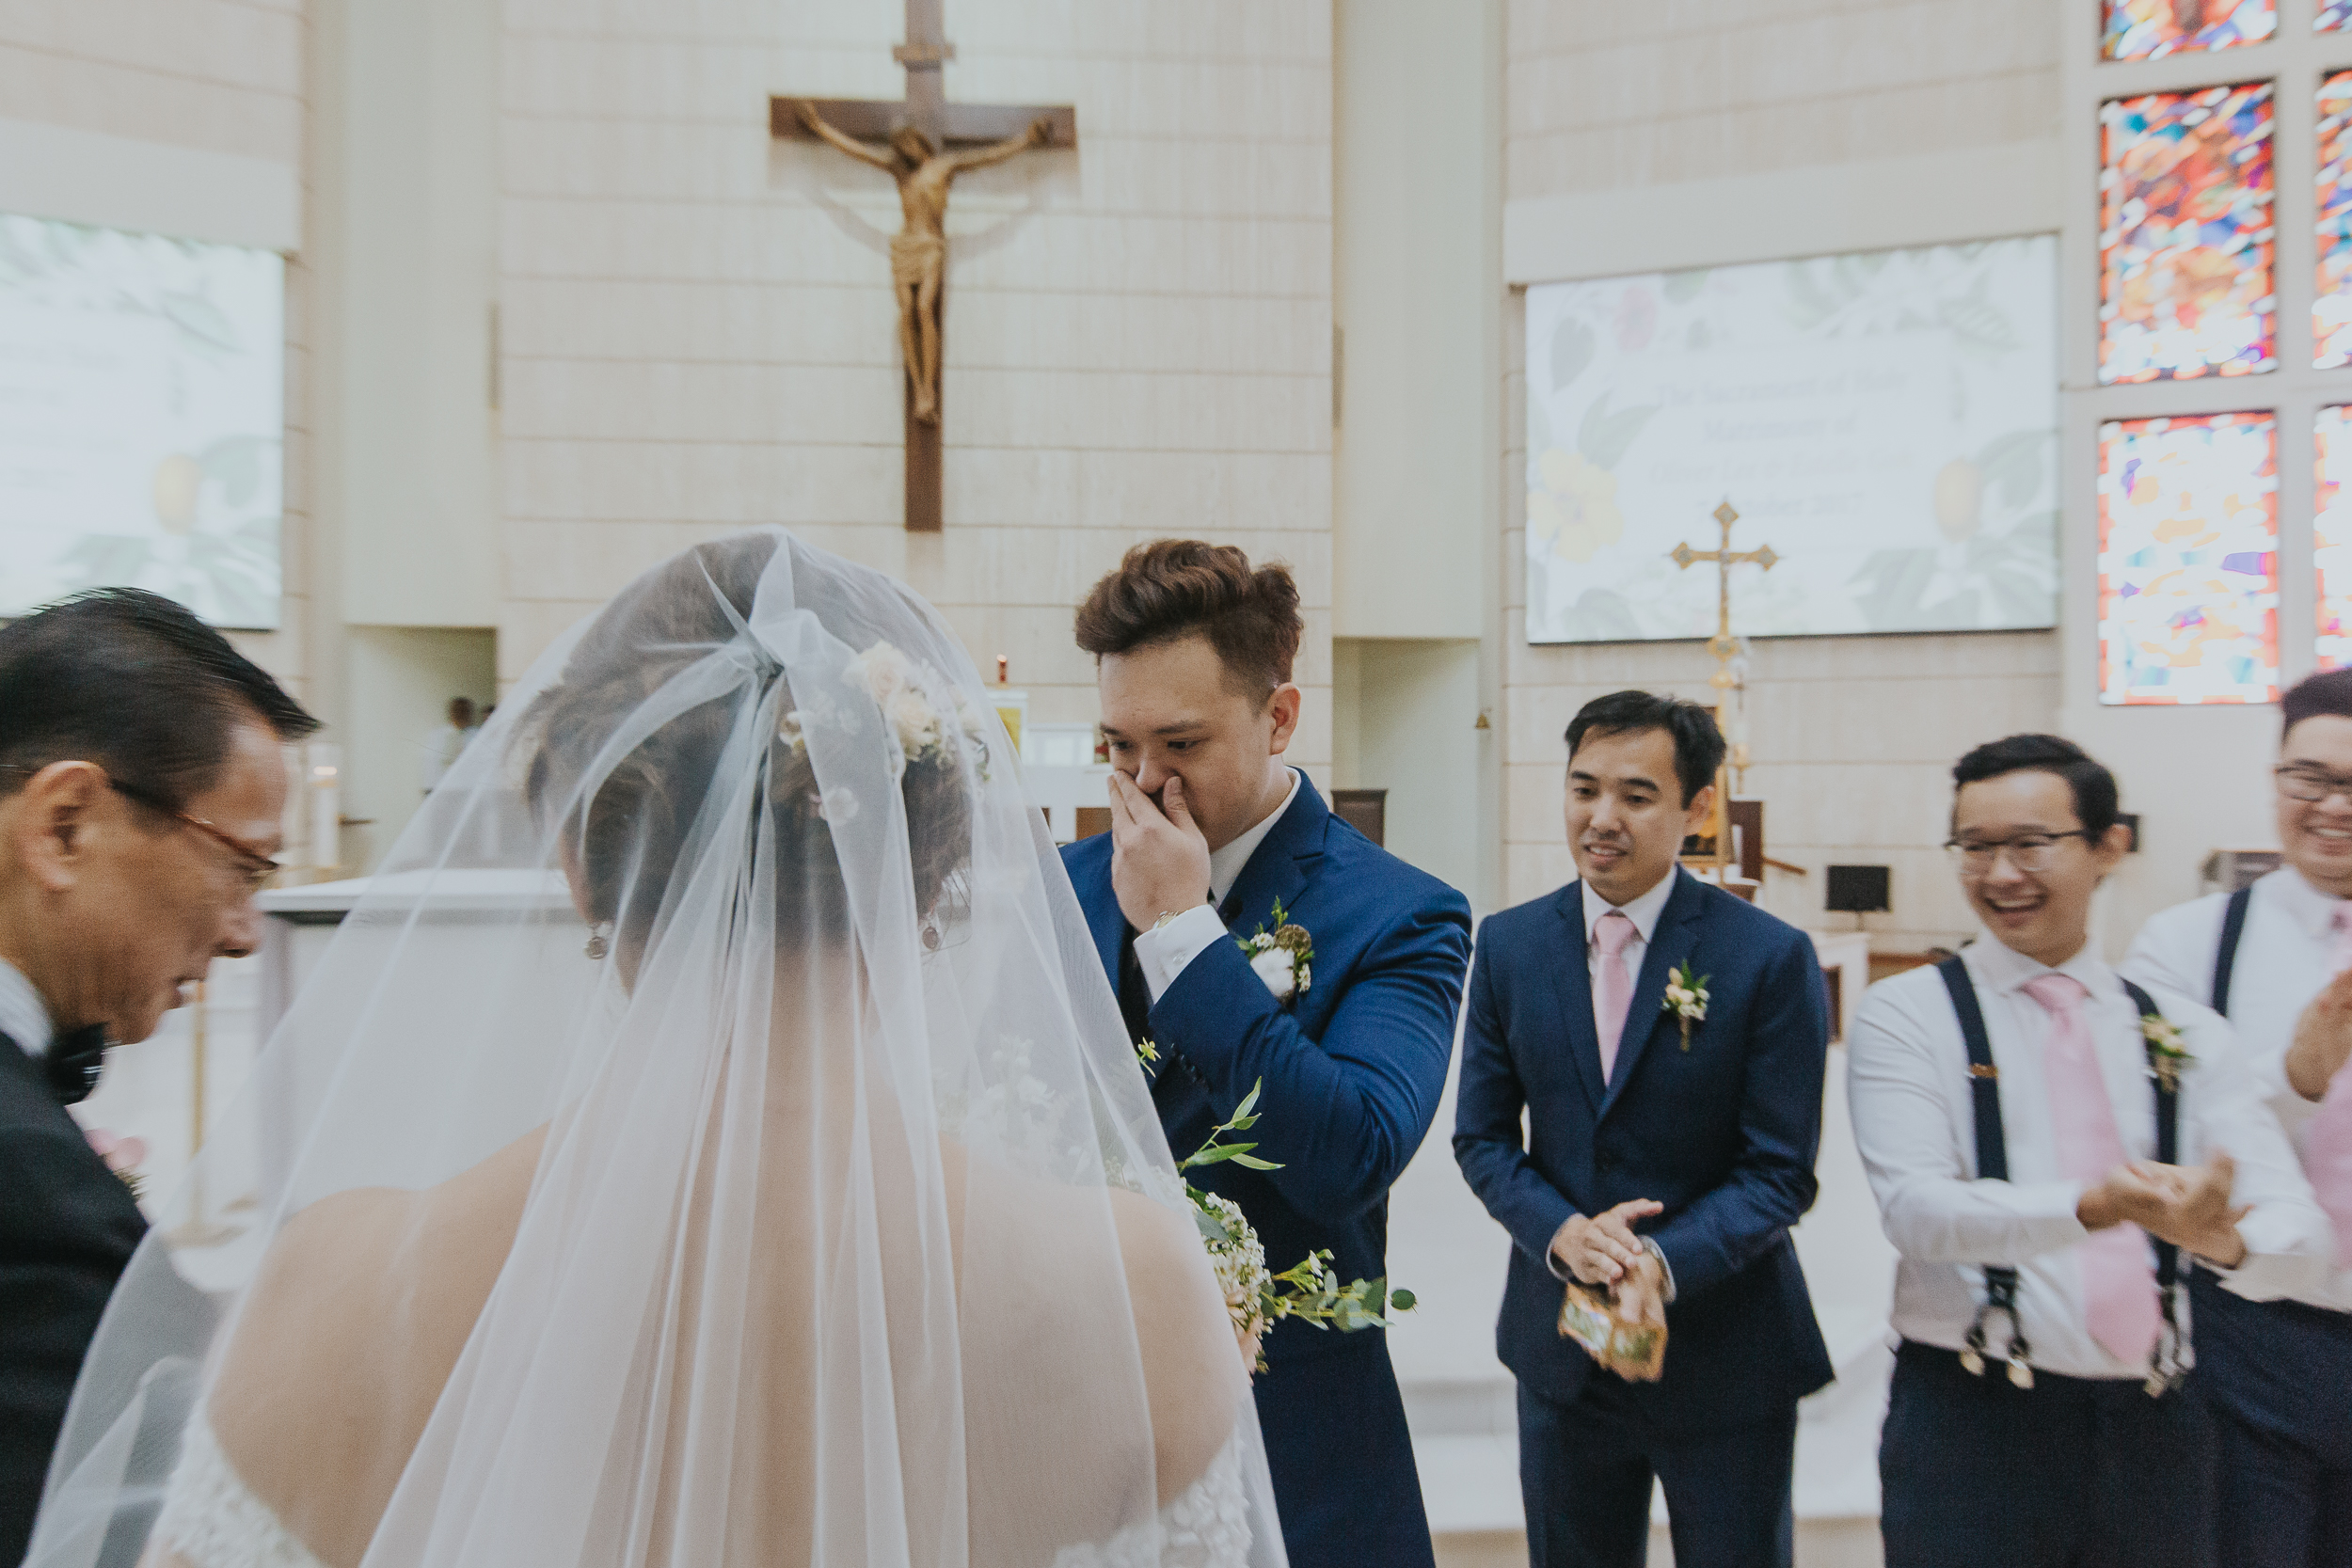 Singapore+Actual+Day+Wedding+Photographer+Grand+Mercure+Oliver+Estelle-0048.jpg